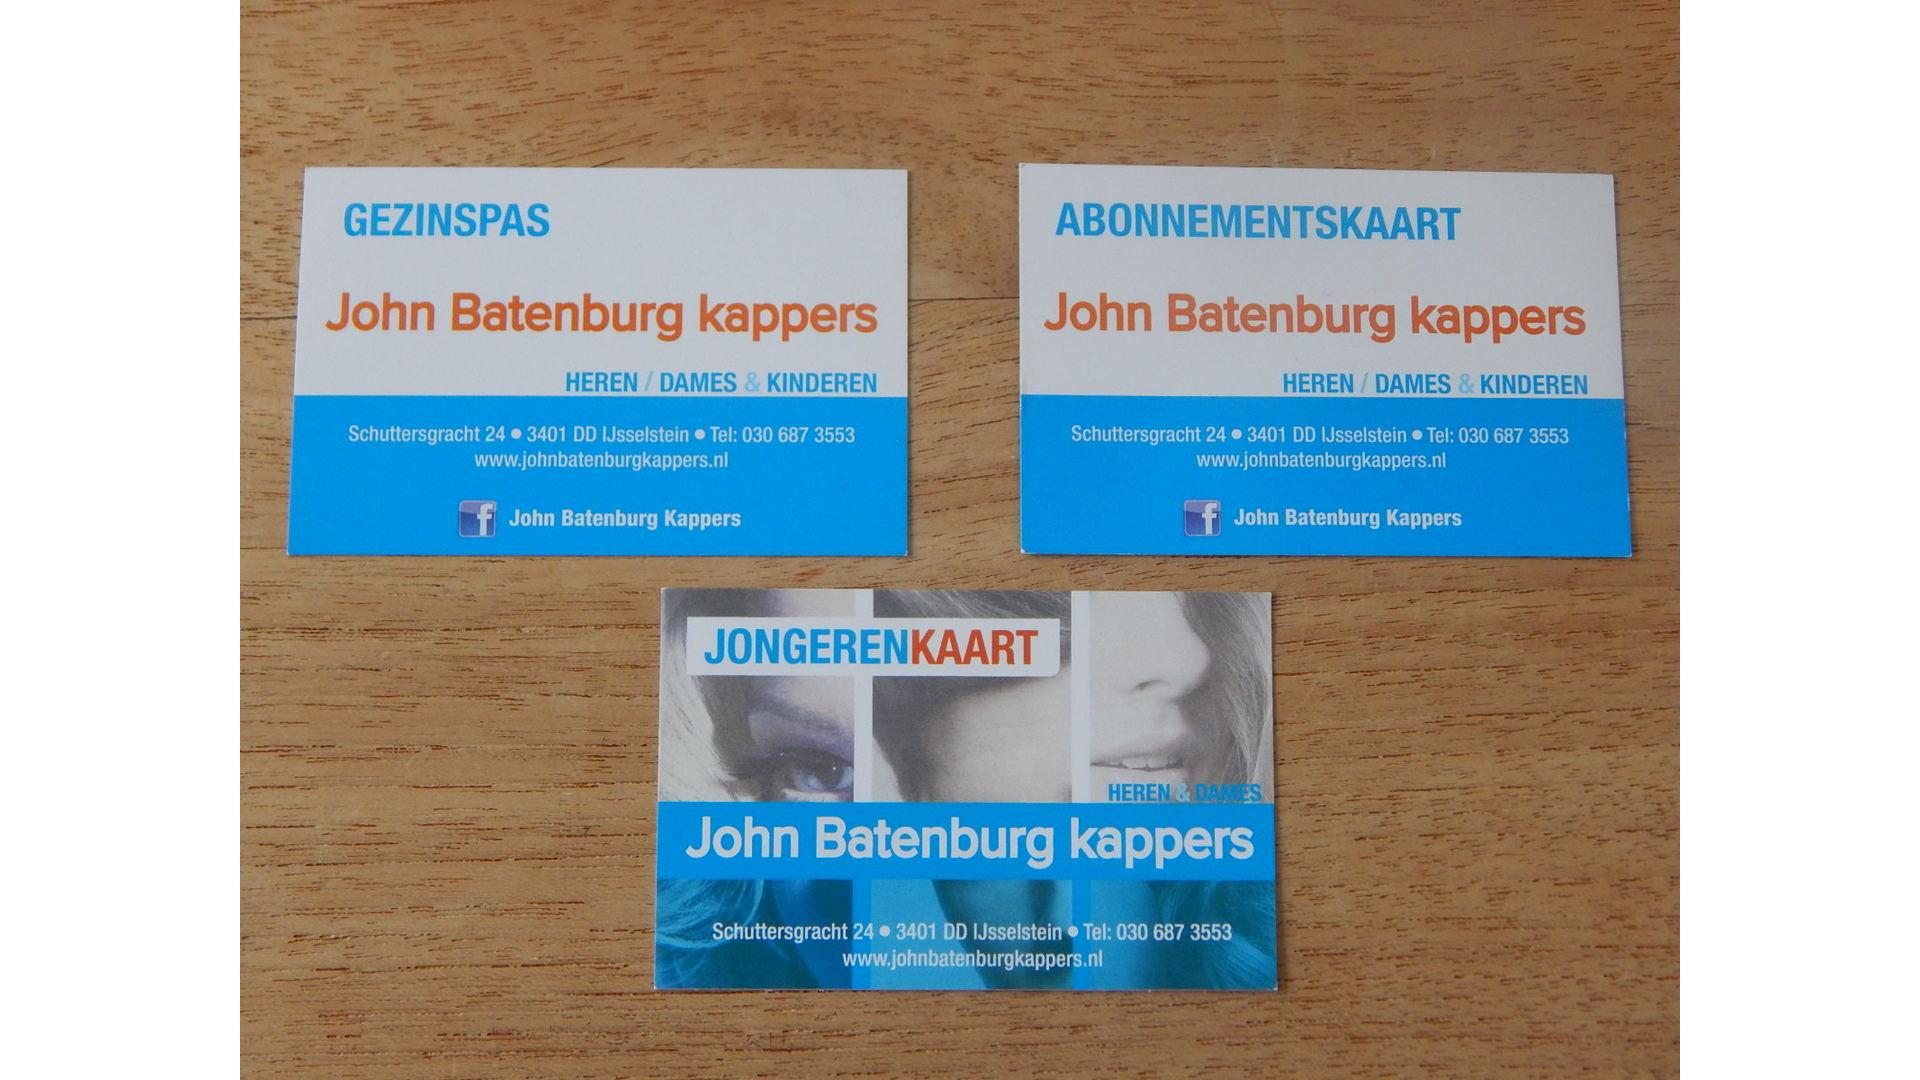 John Batenburg Kappers